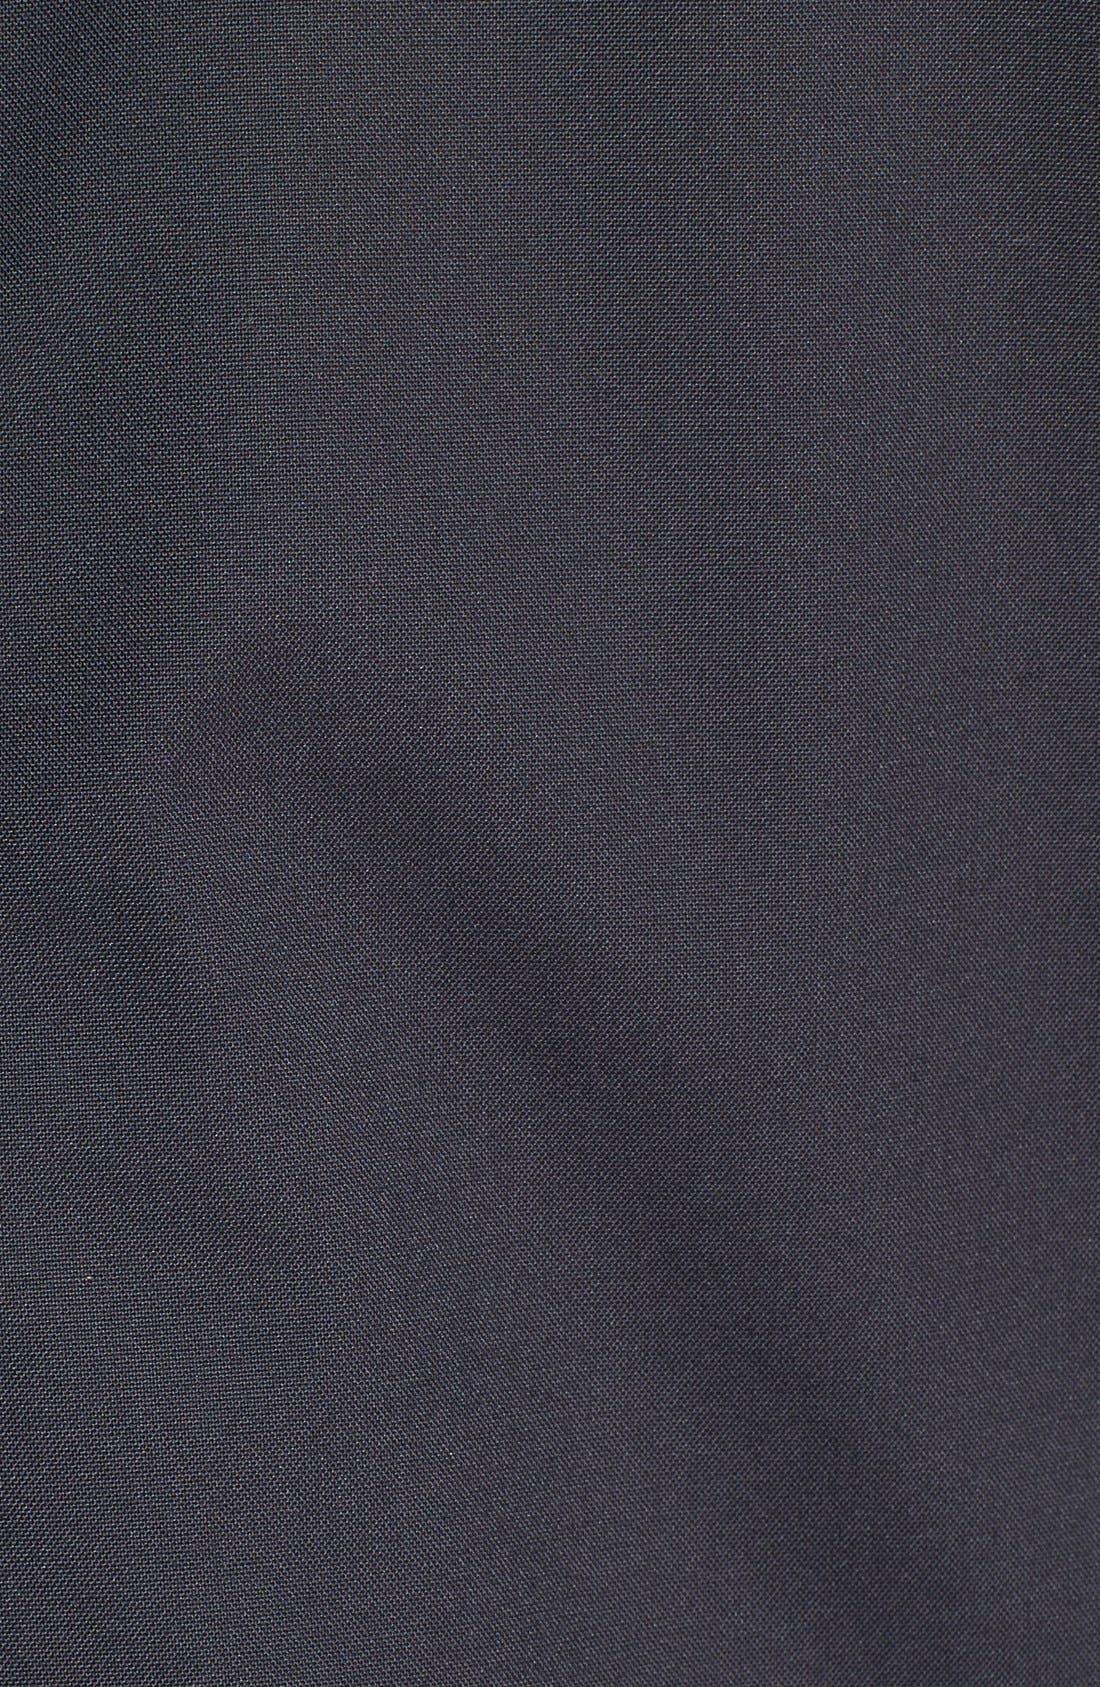 Woolrich 'Teton Rudder' Hooded Canvas Jacket,                             Alternate thumbnail 6, color,                             410